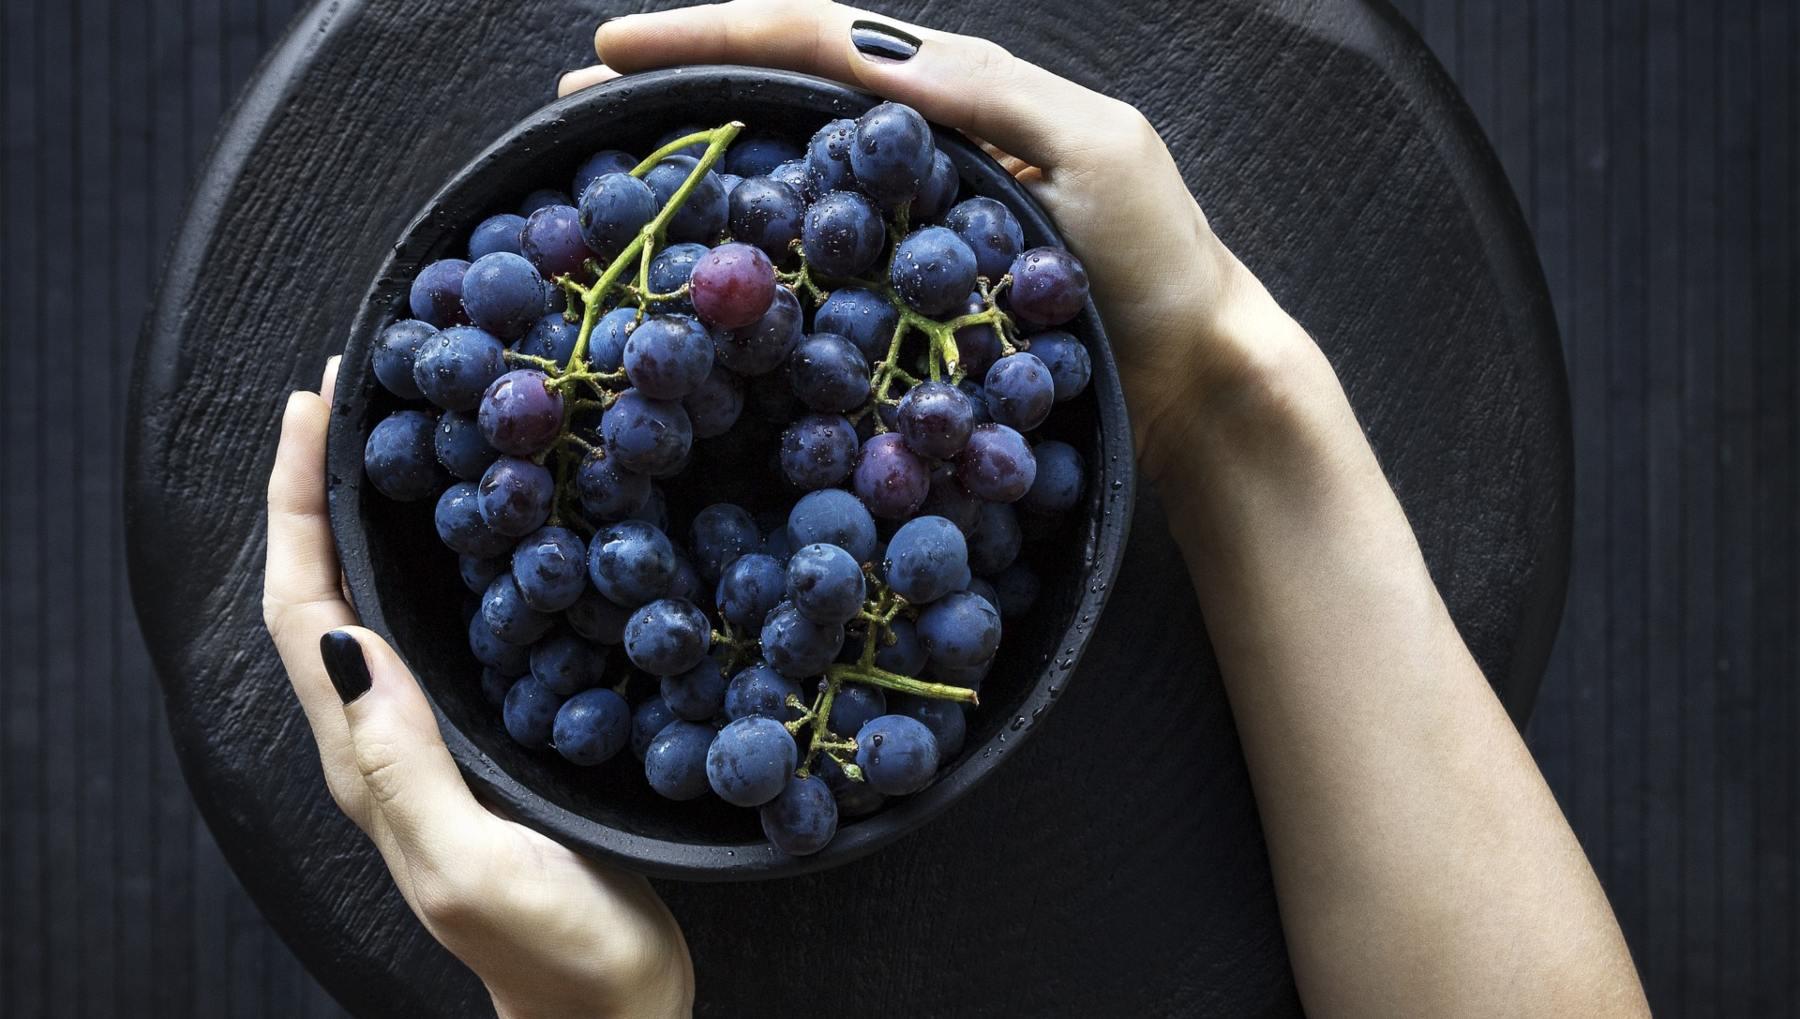 Torta crocante de uvas